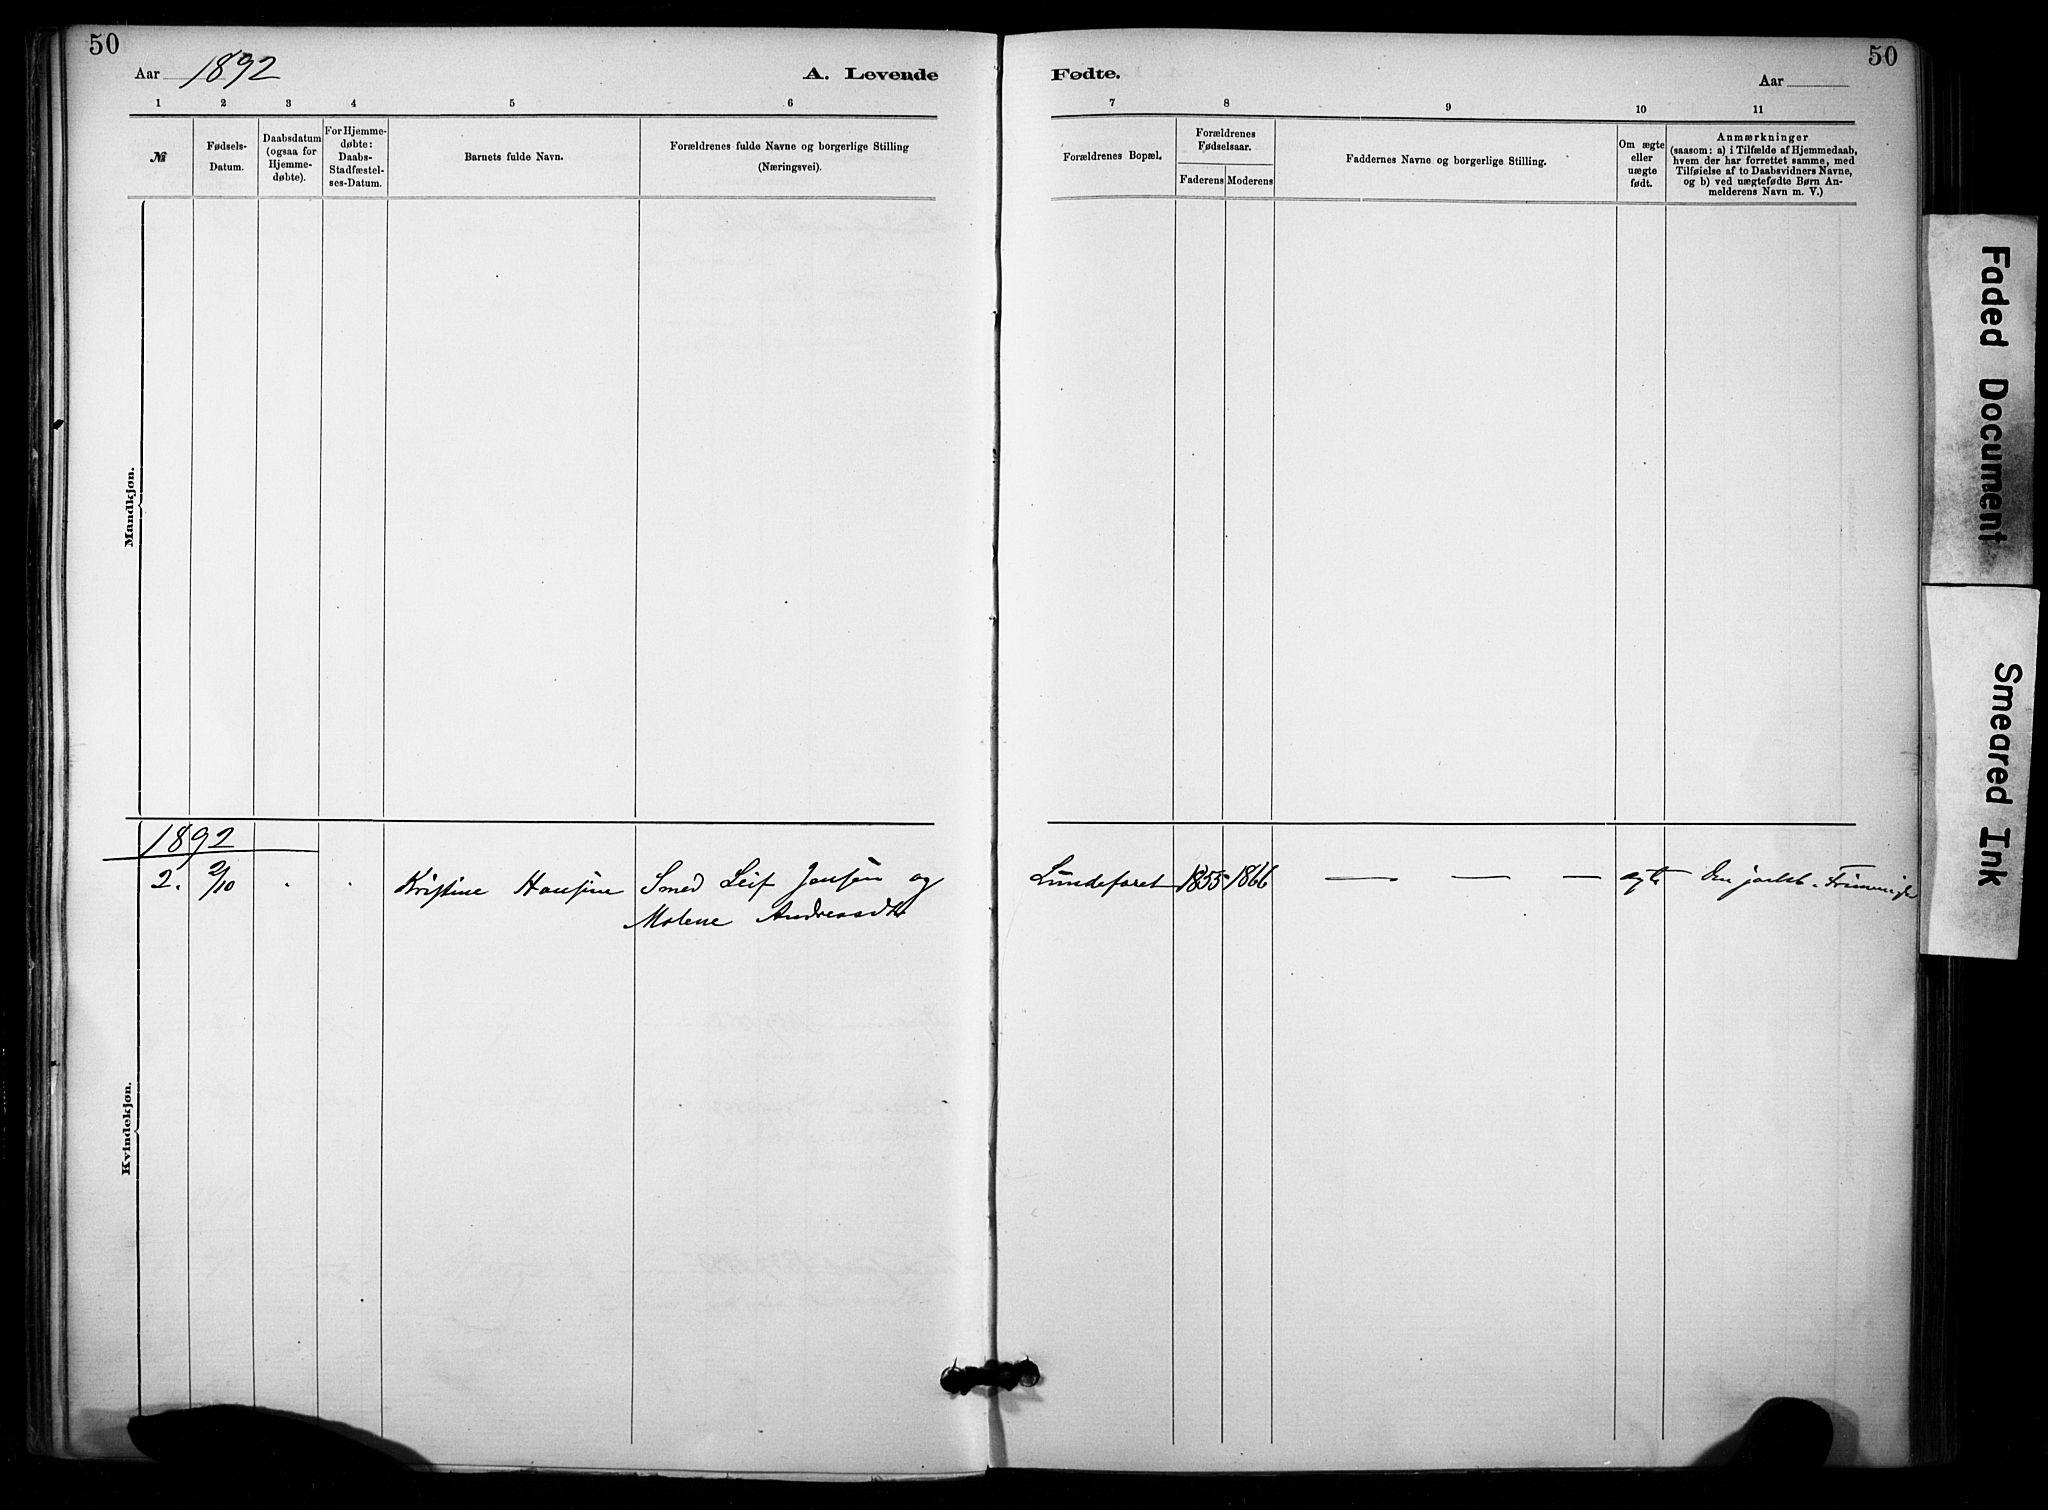 SAKO, Lunde kirkebøker, F/Fa/L0002: Ministerialbok nr. I 2, 1884-1892, s. 50